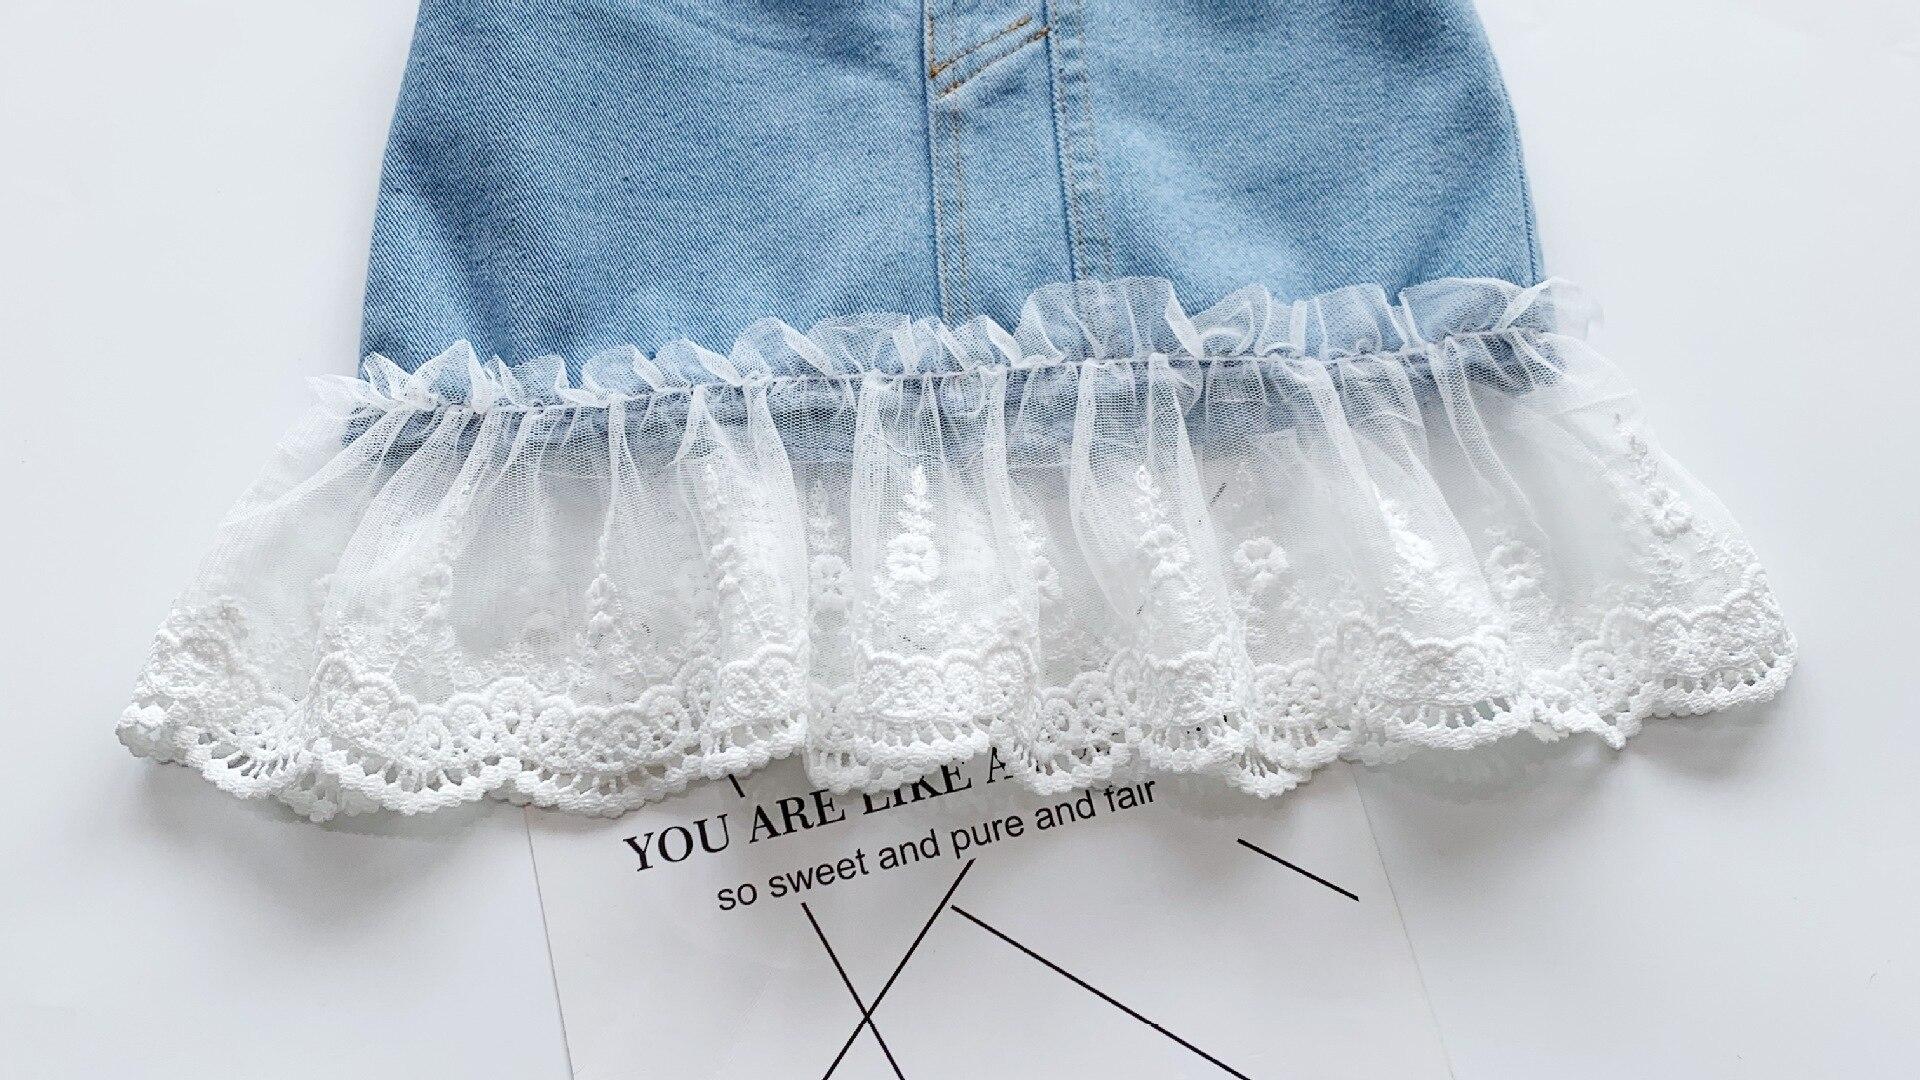 Jargazol Fashion Kids Clothes Puff Sleeve Shirt&lace Denim Skirt Korean Summer Little Girls Clothing Set Cute Children Outfits 4